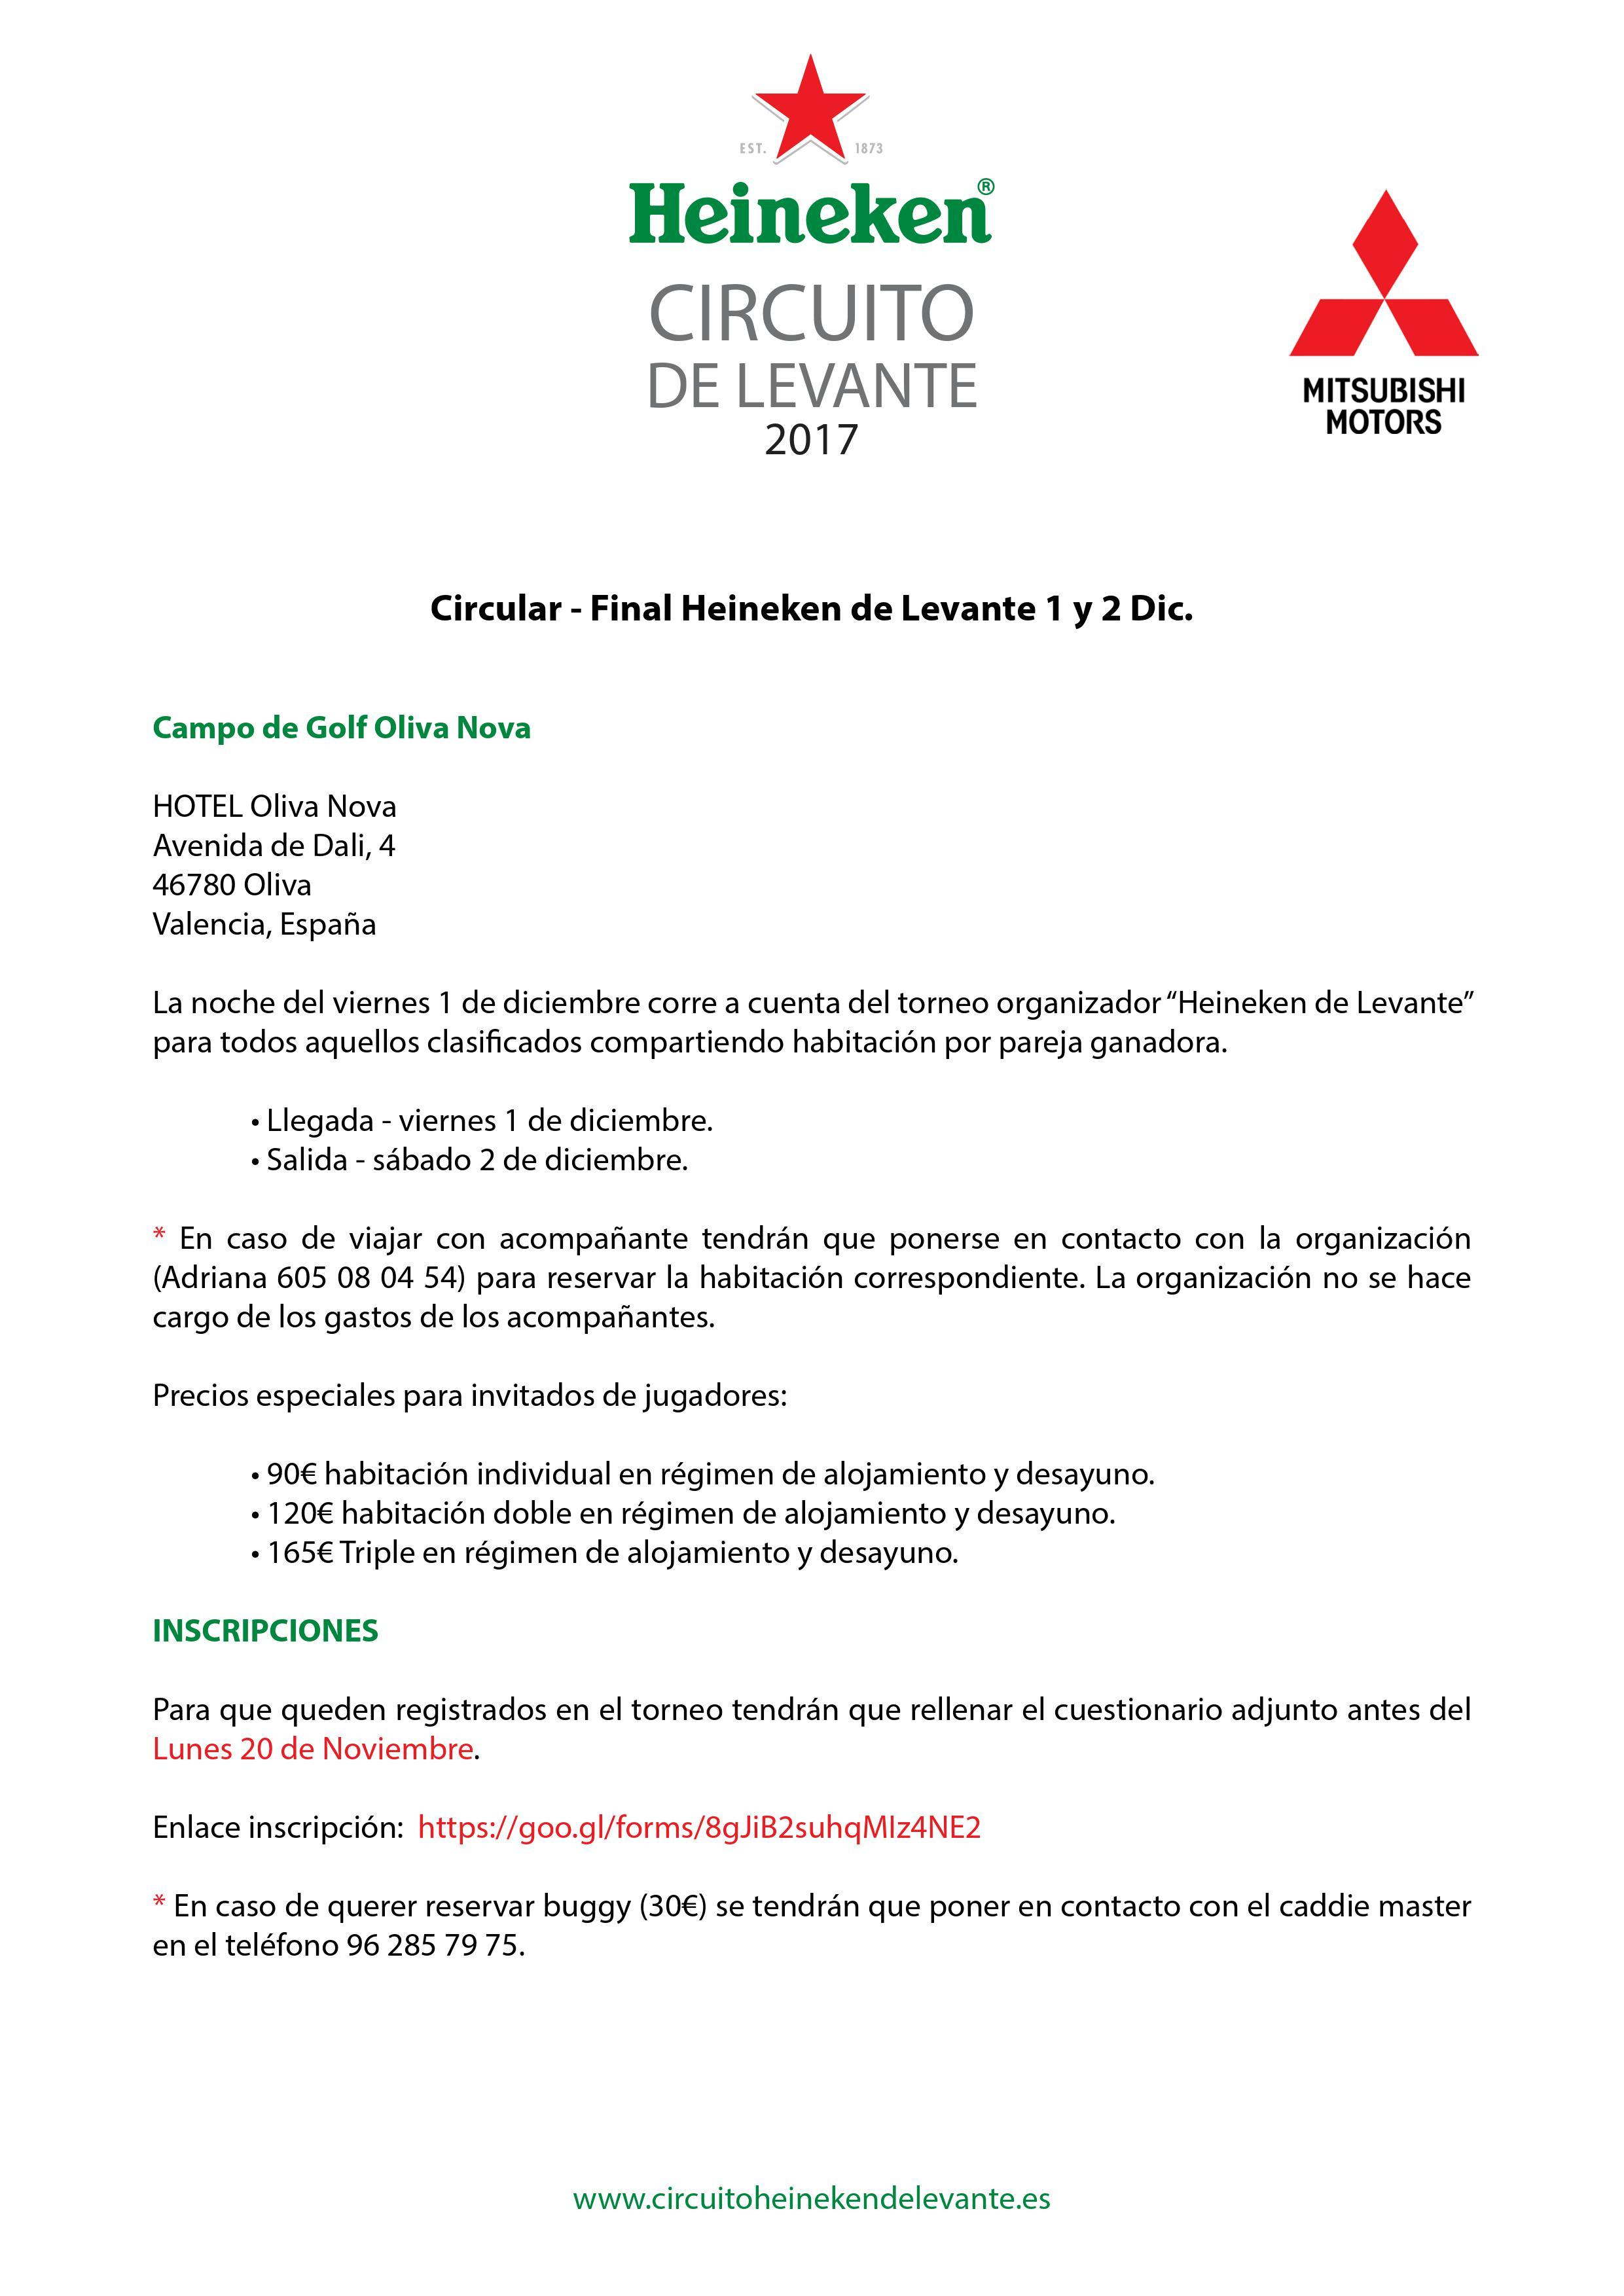 171202 OLI, Reglamento del torneo (1)